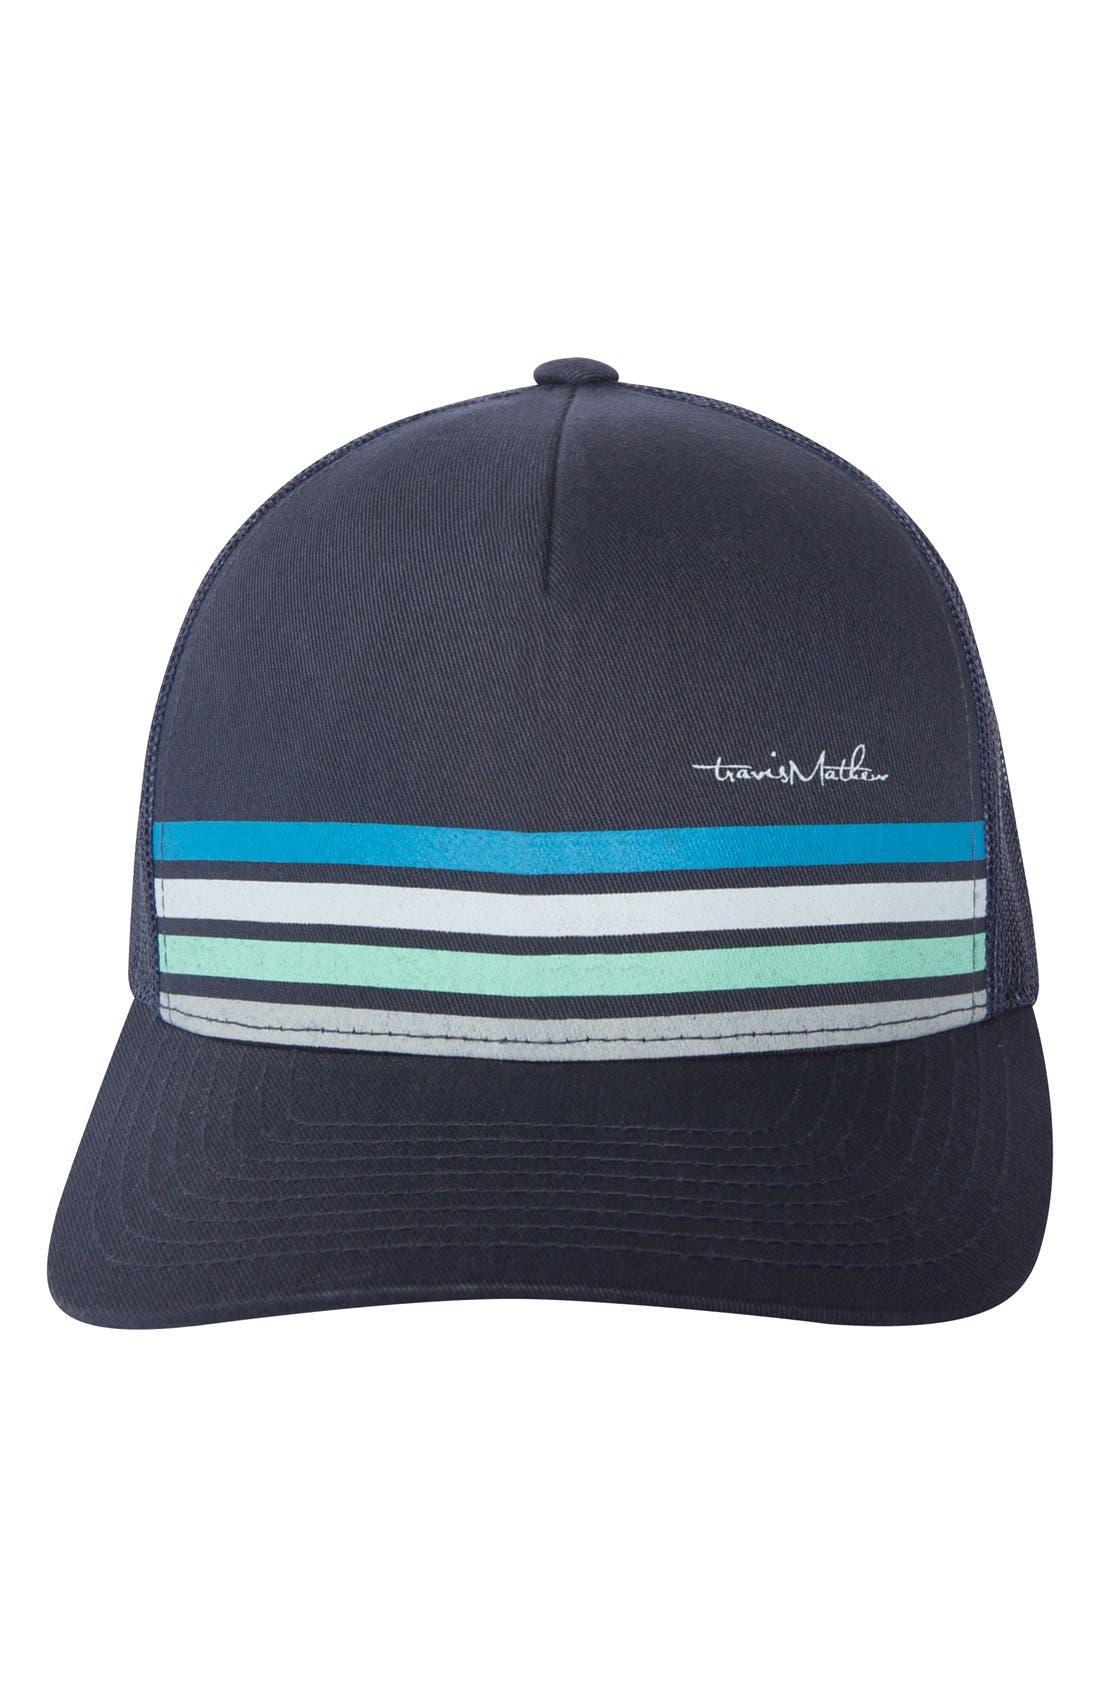 Travis Mathew 'Hoover' Hat